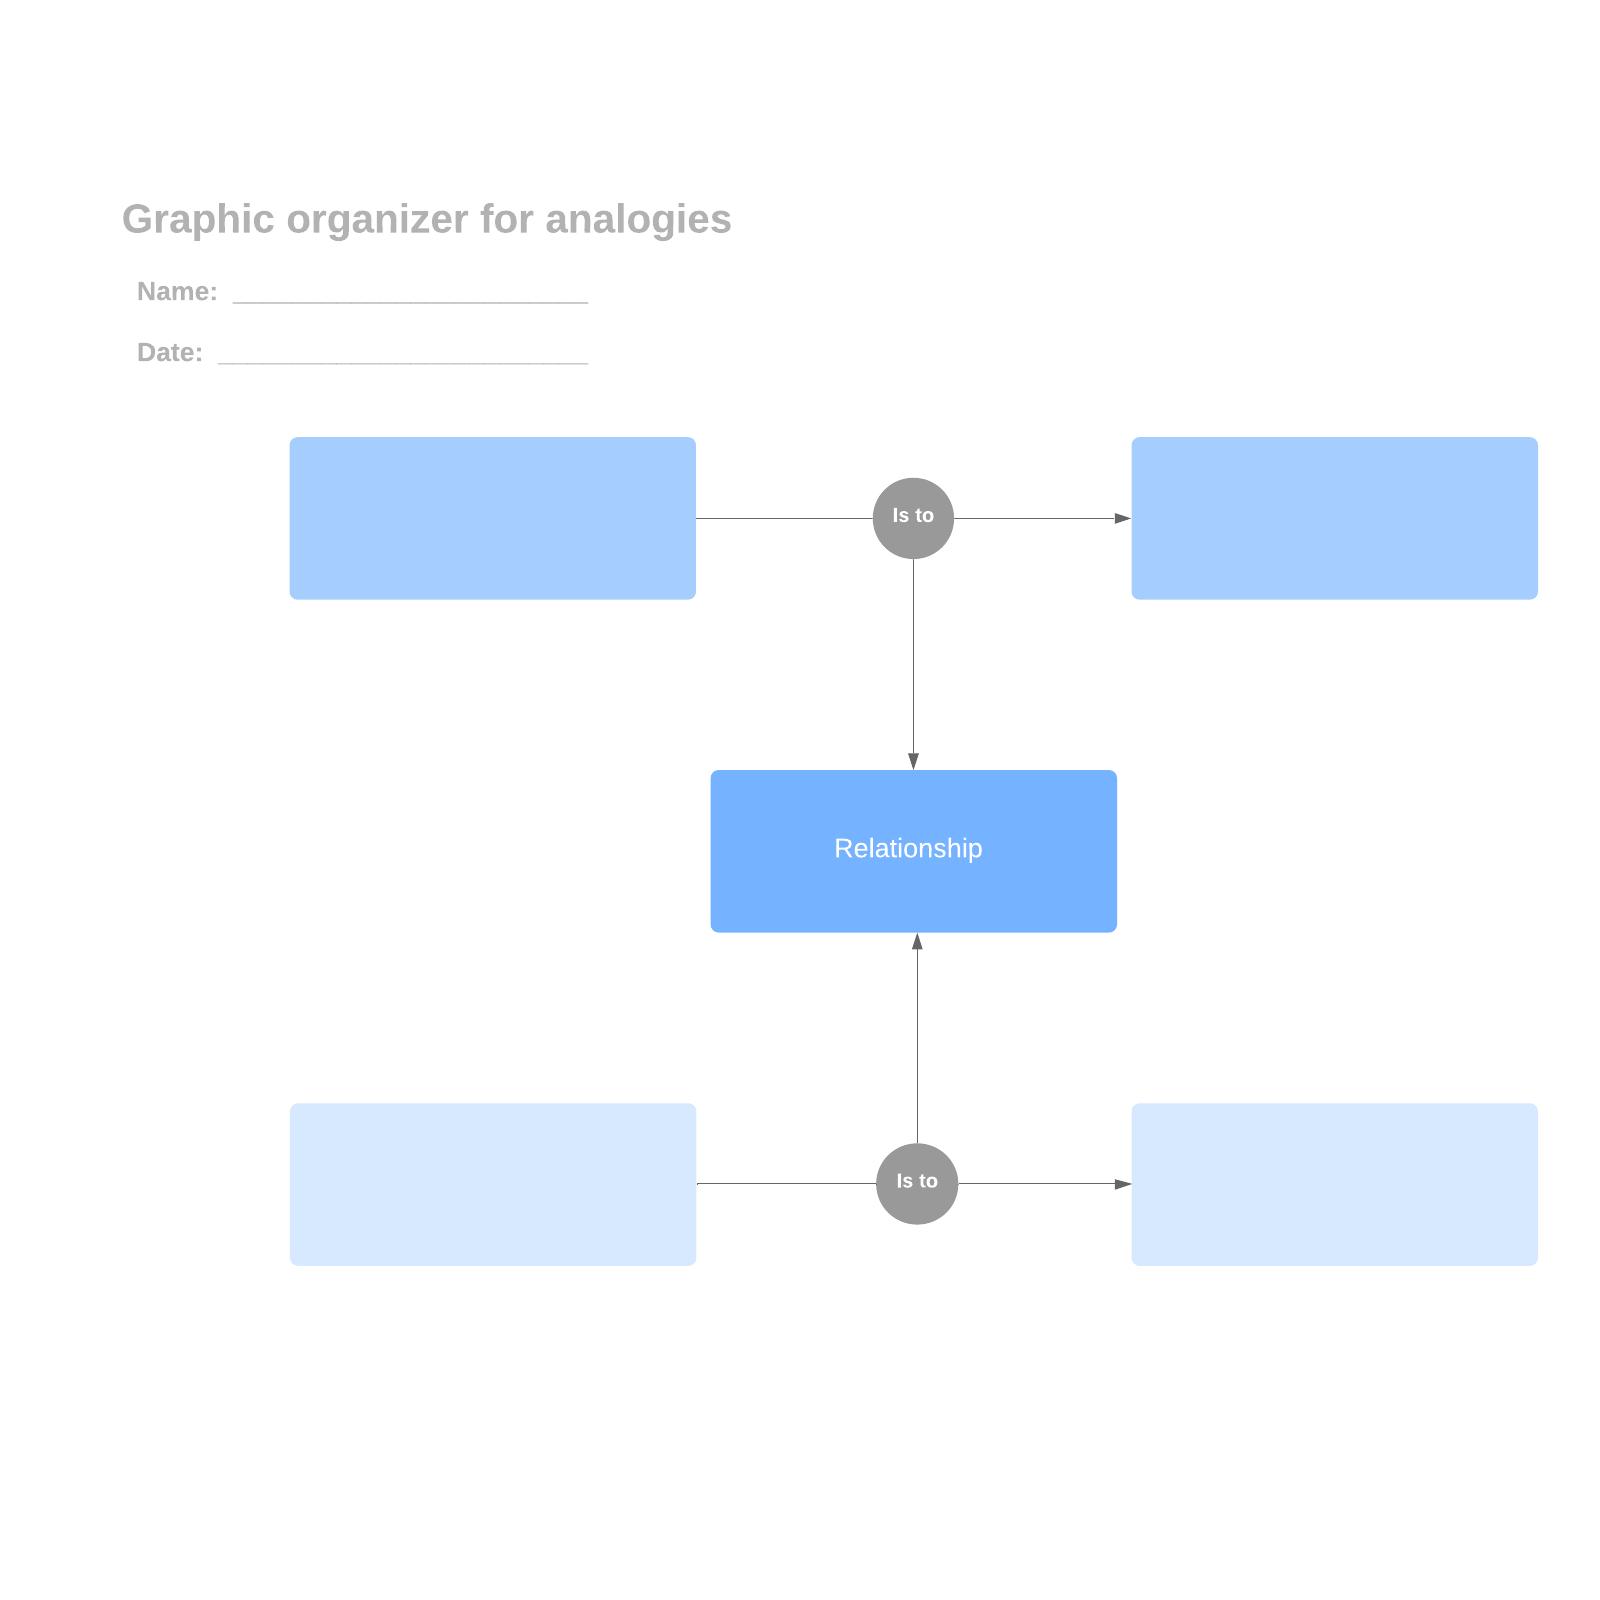 Graphic organizer for analogies